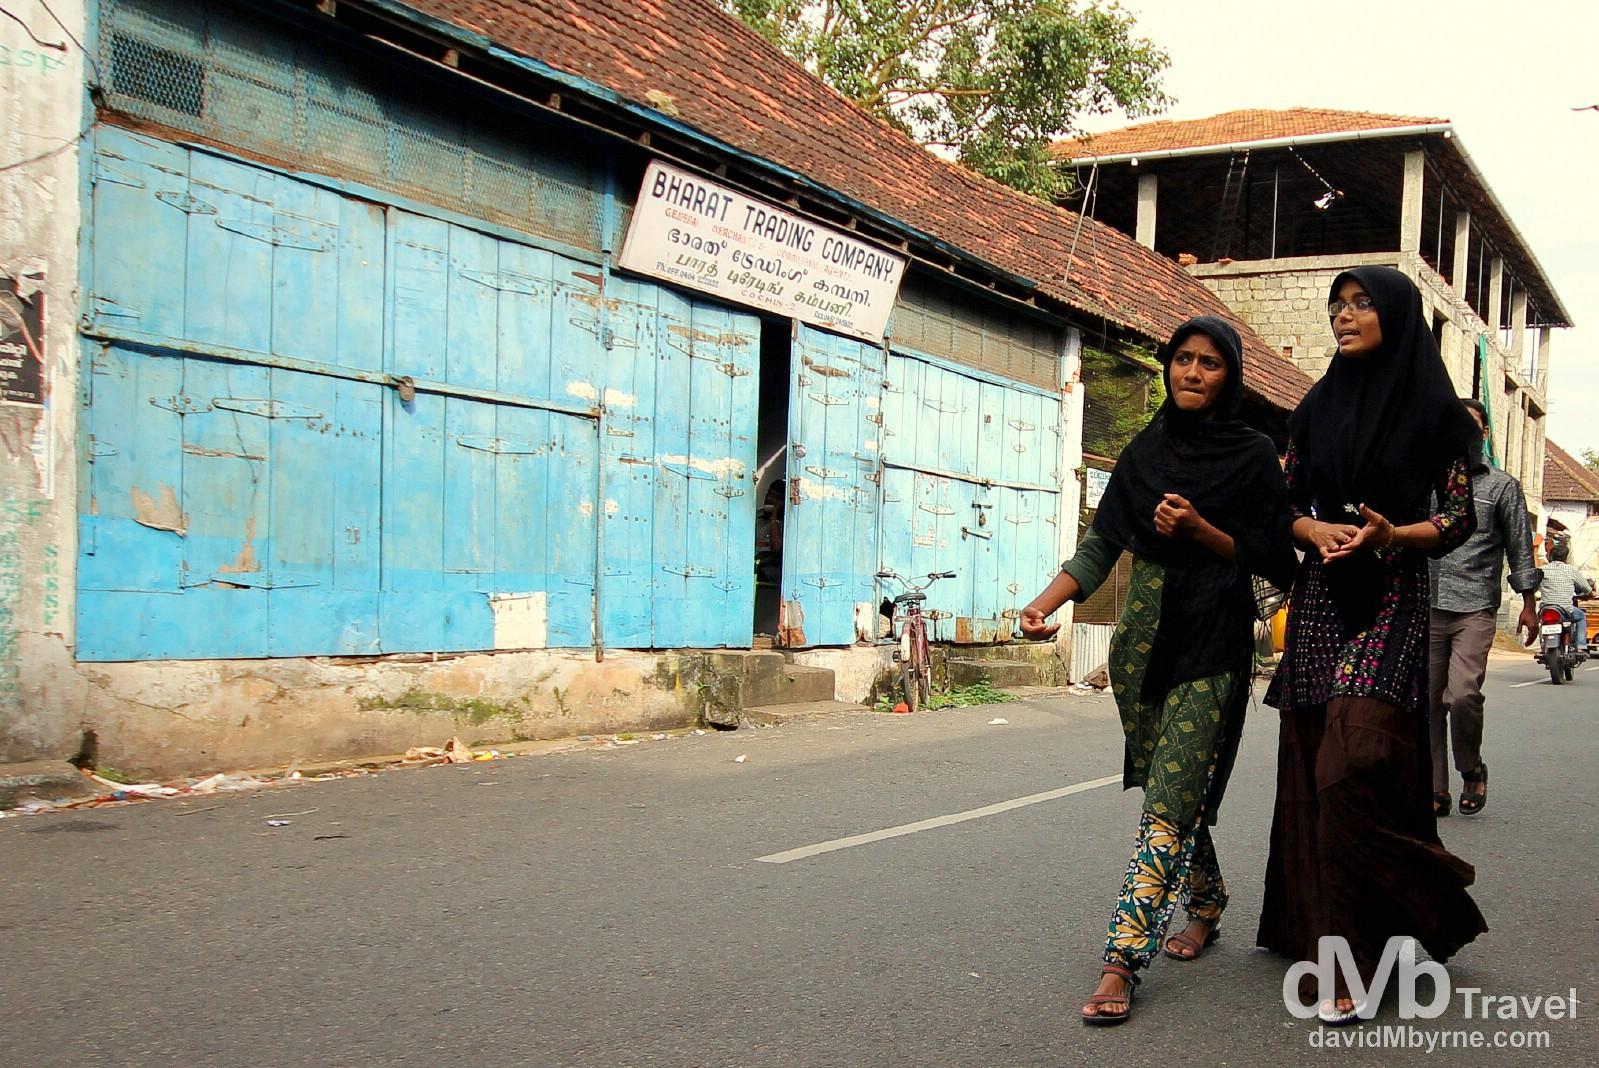 Bazaar Road, Forth Cochin, Kerala, India. September 18th 2012.